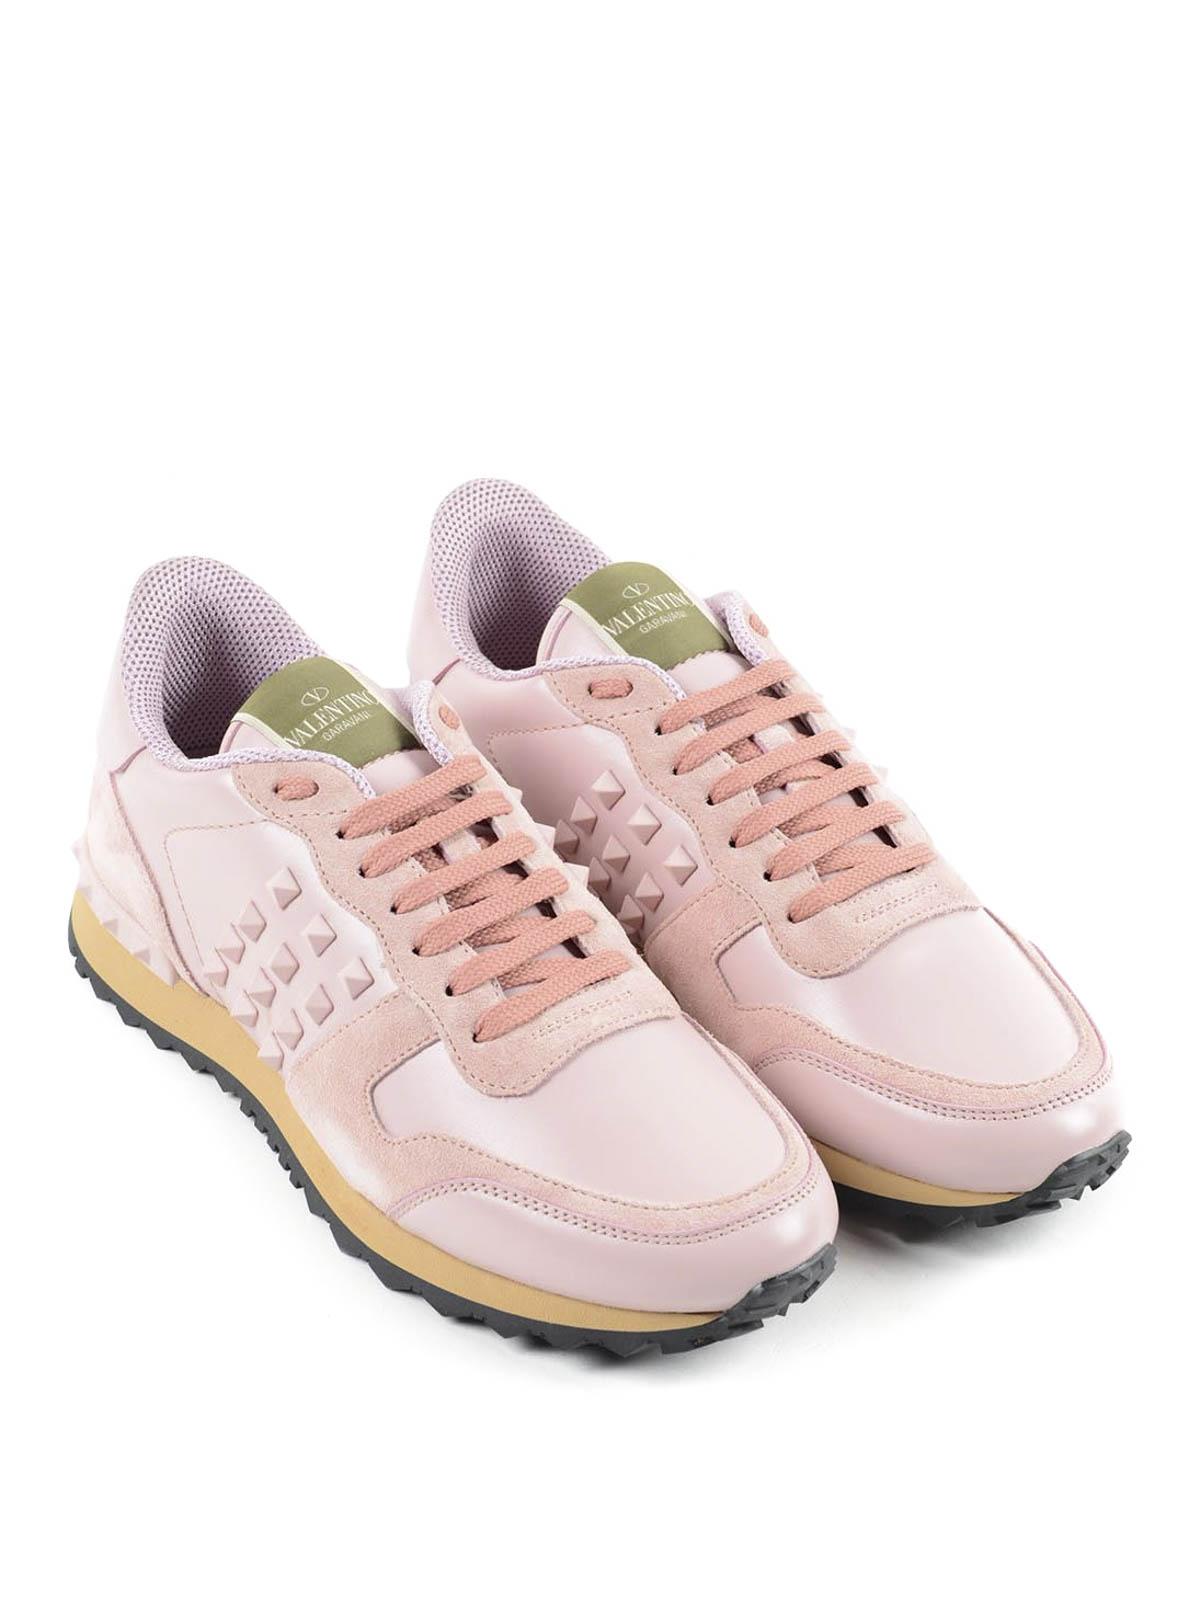 De Garavani Valentino Sneakers Sport Chaussures Rockrunner 67YvfIbgym